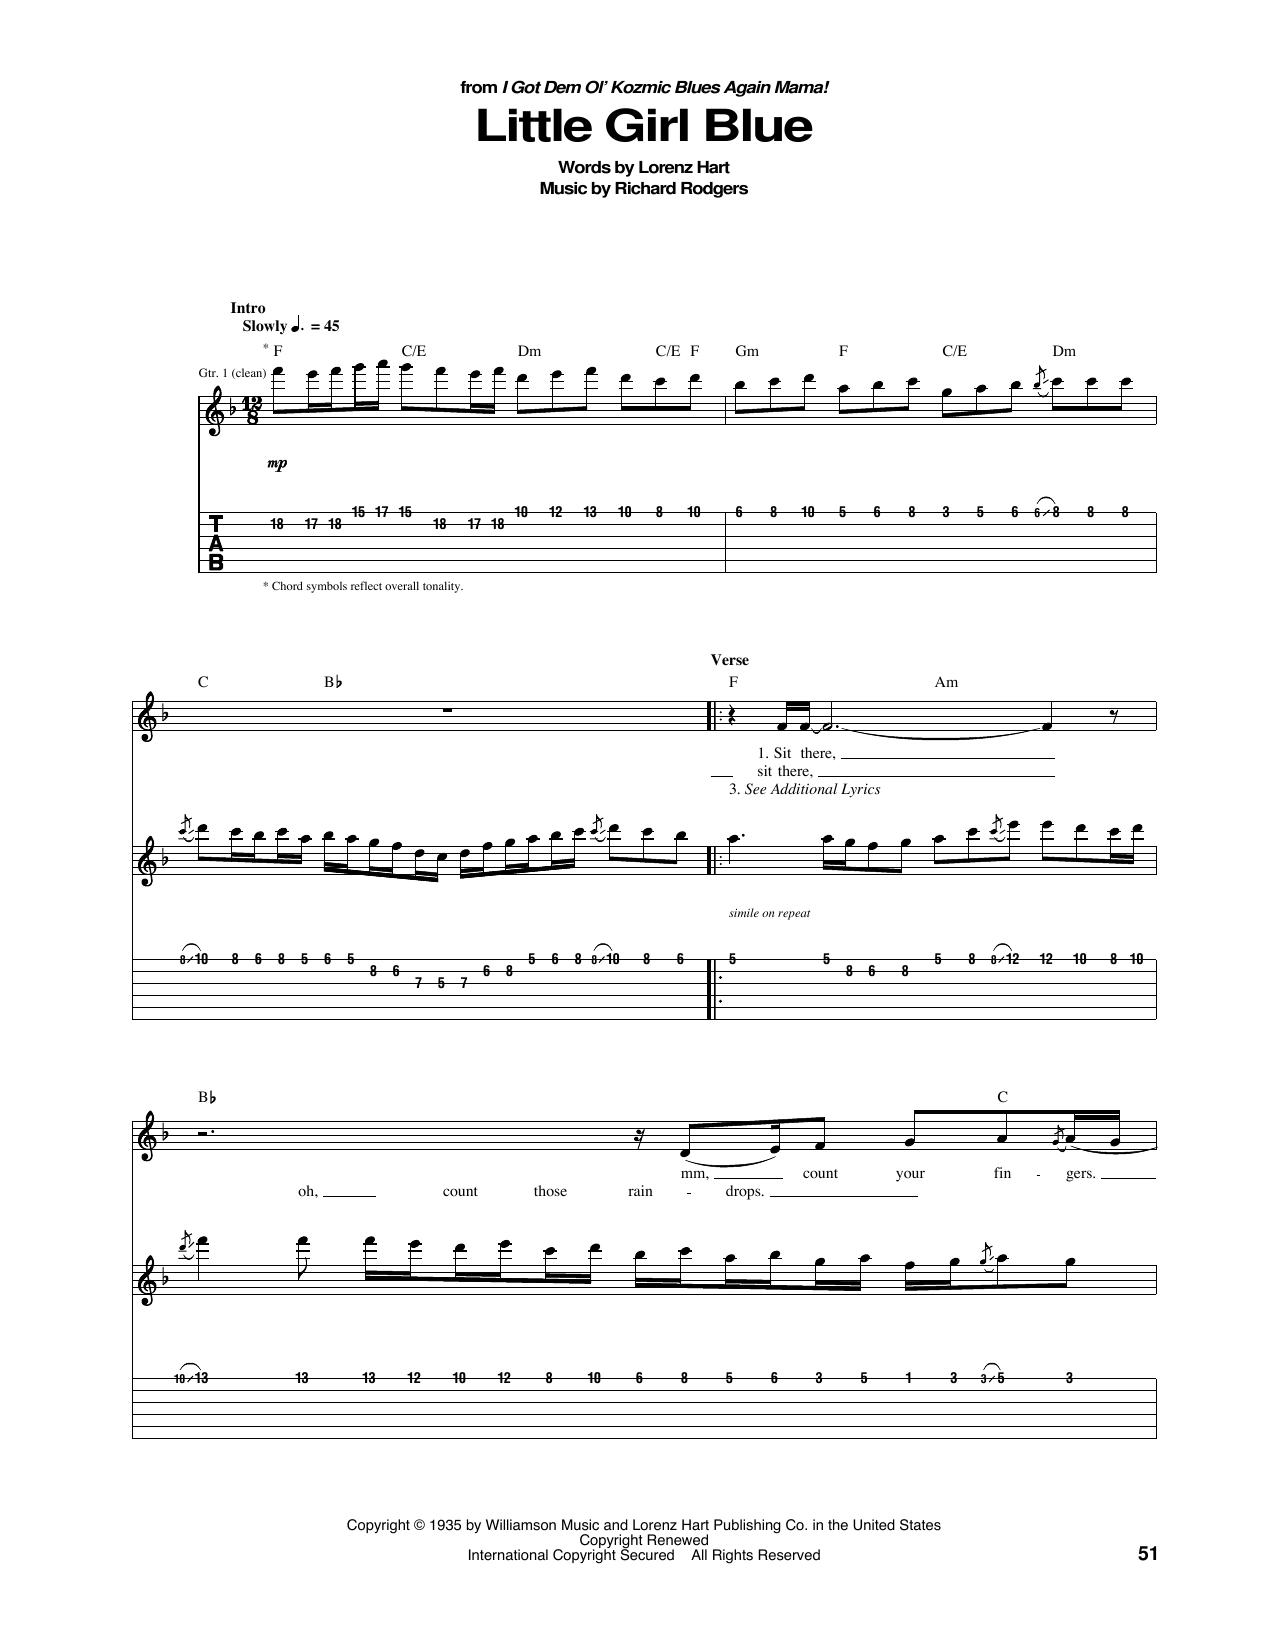 Janis Joplin Little Girl Blue sheet music notes and chords. Download Printable PDF.